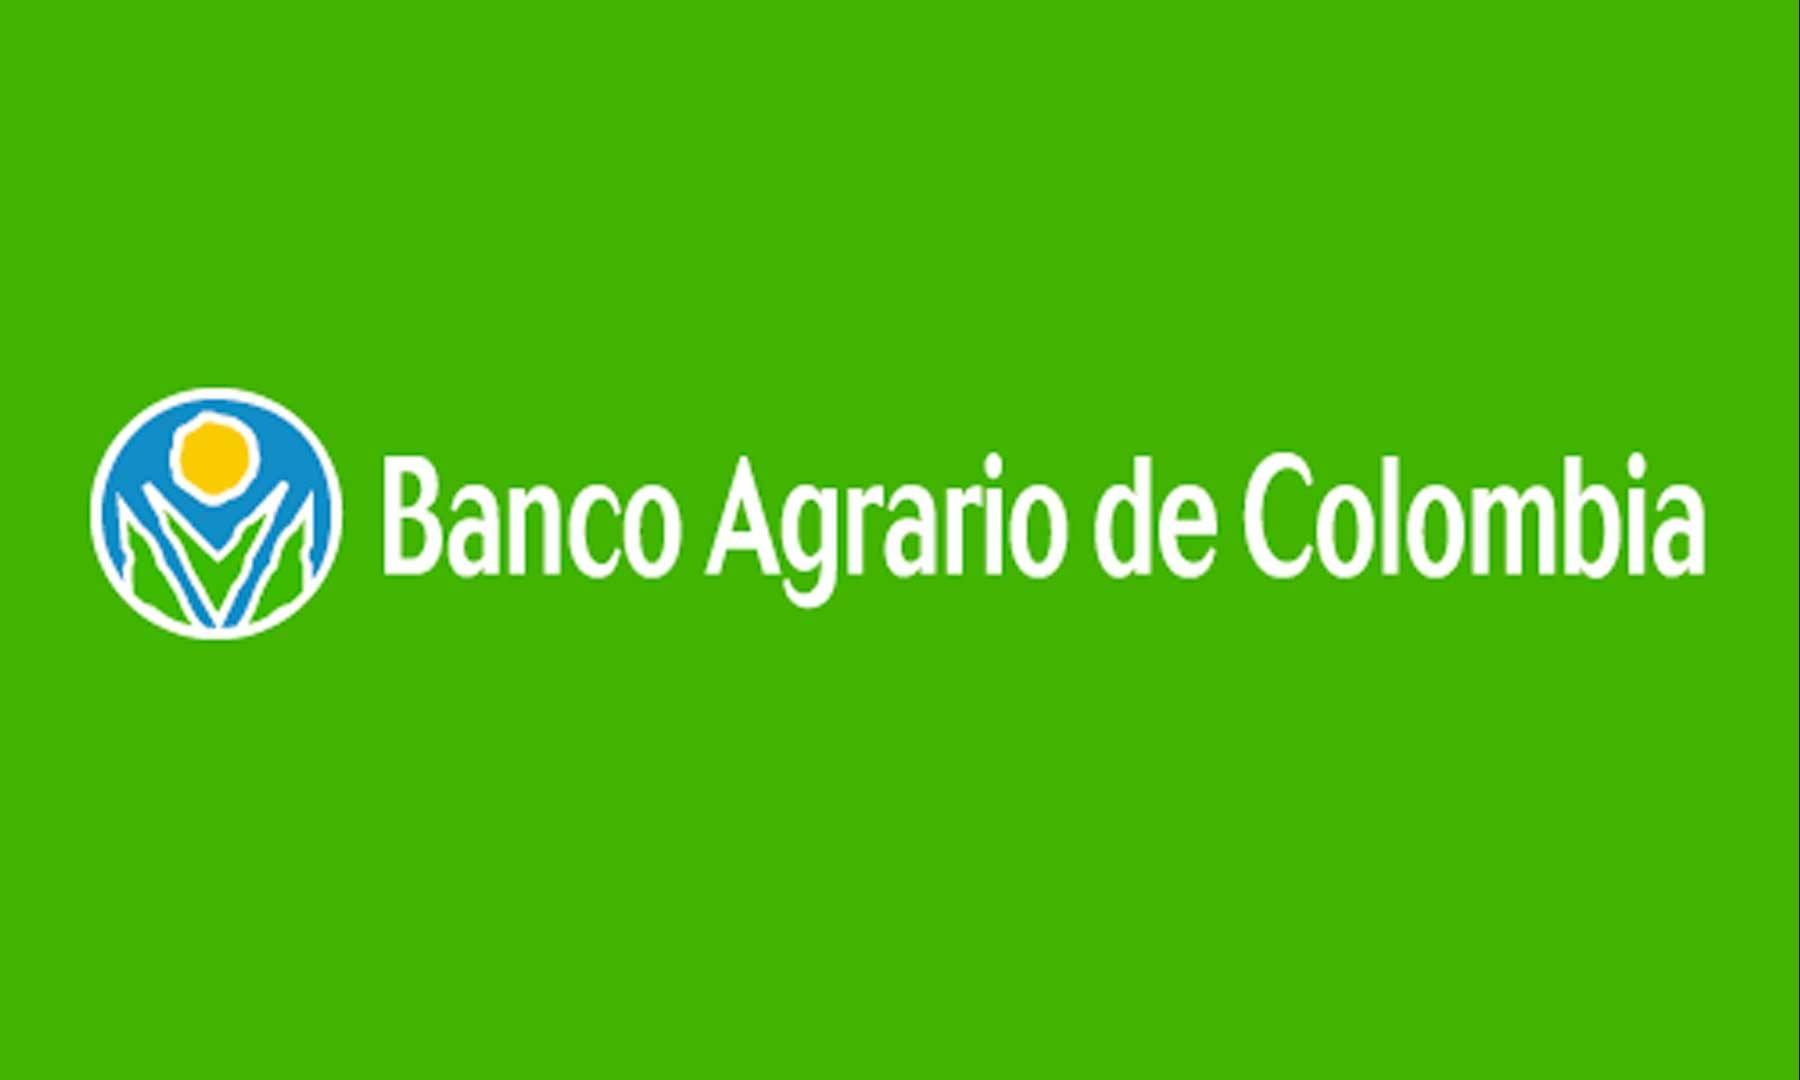 Ingreso Solidario: Sexto y séptimo giro en Banco Agrario y Caja Social